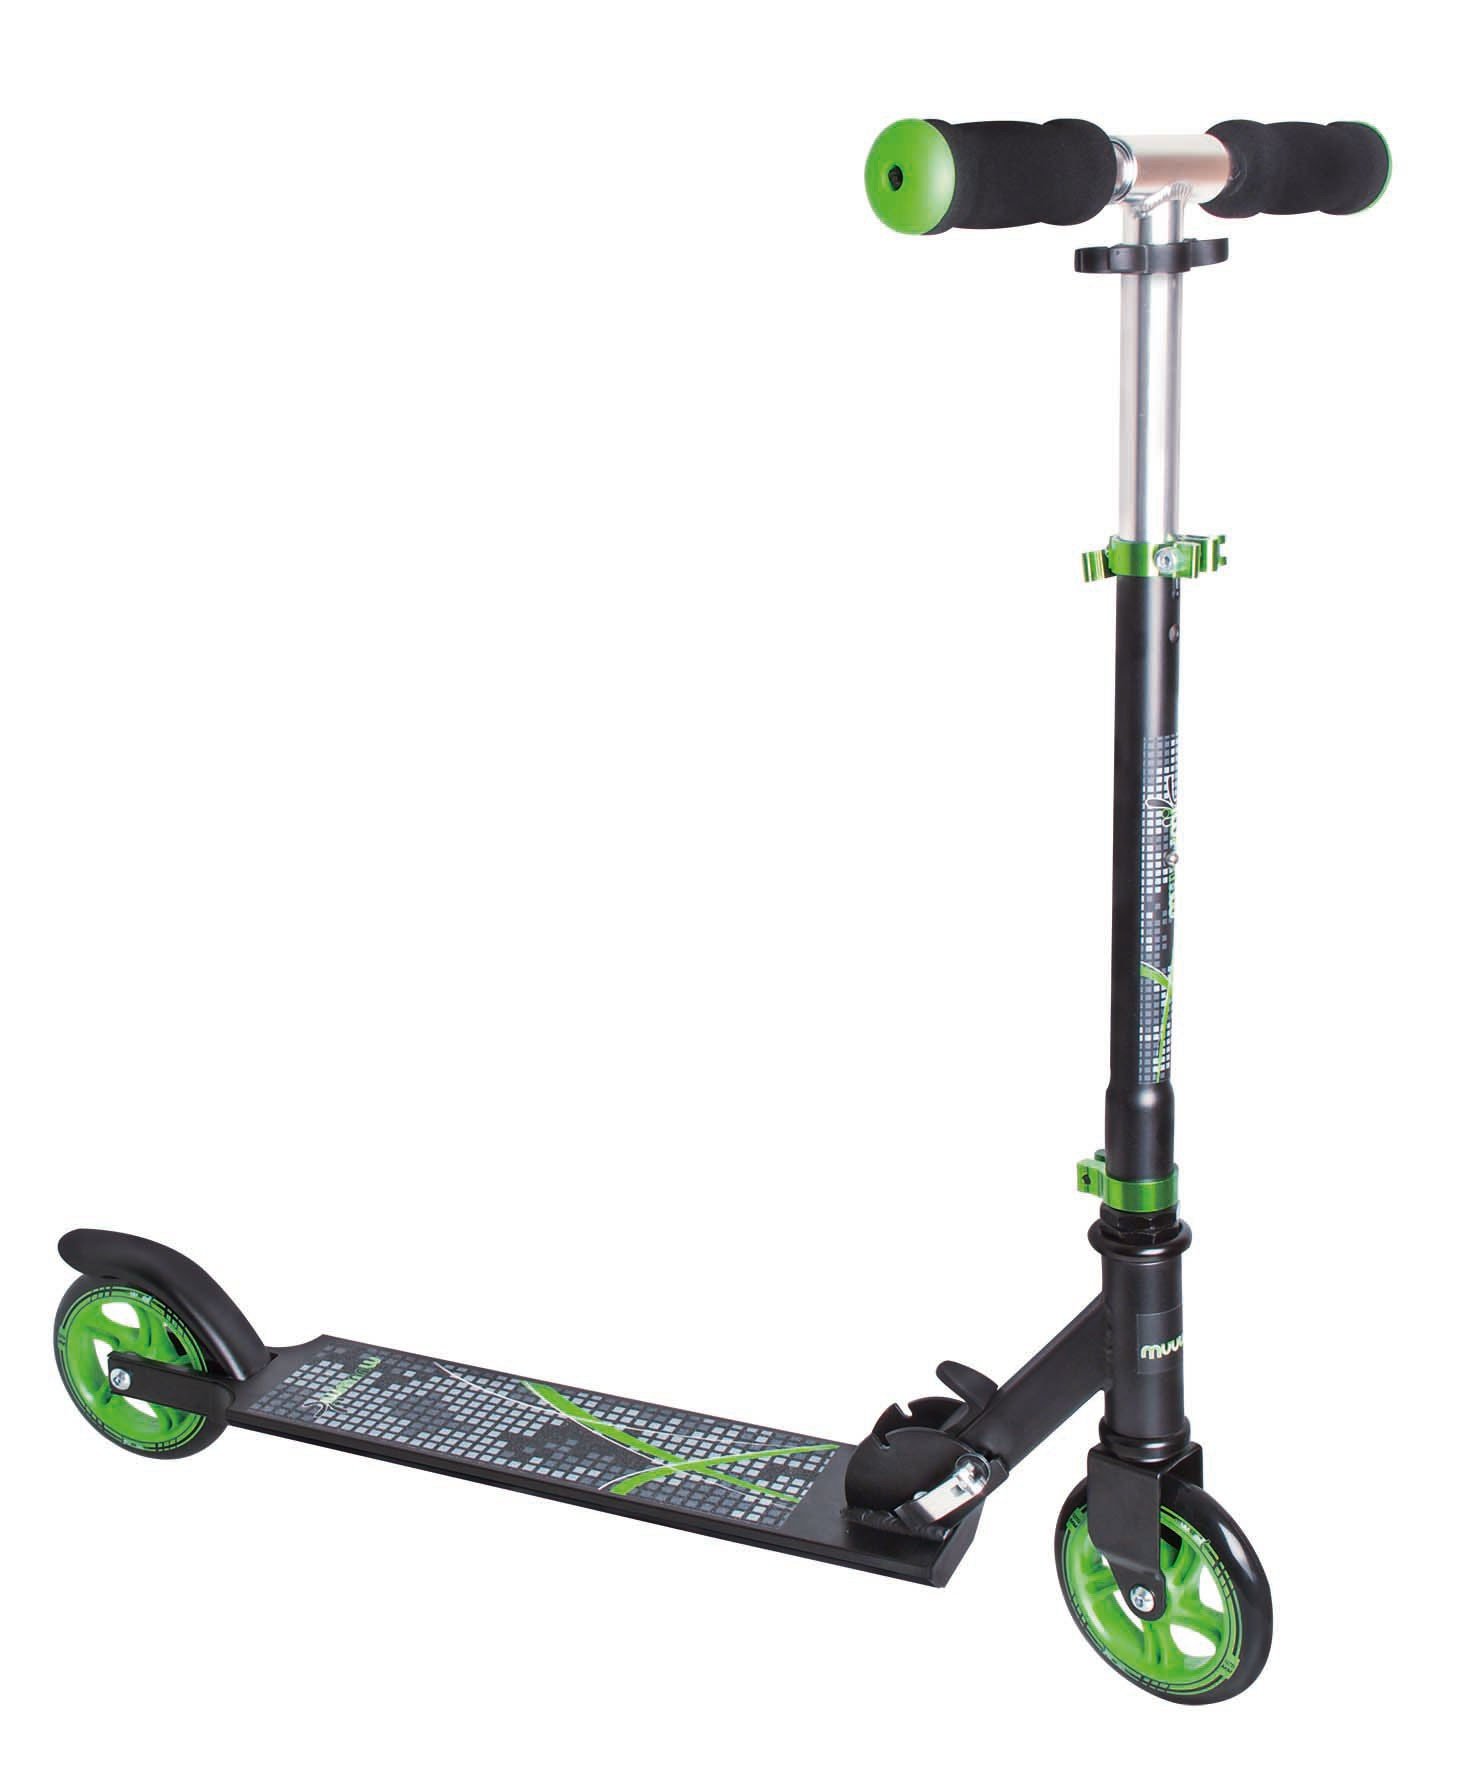 Alu Scooter / Cityroller Muuwmi 125mm schwarz-grün Bild 1